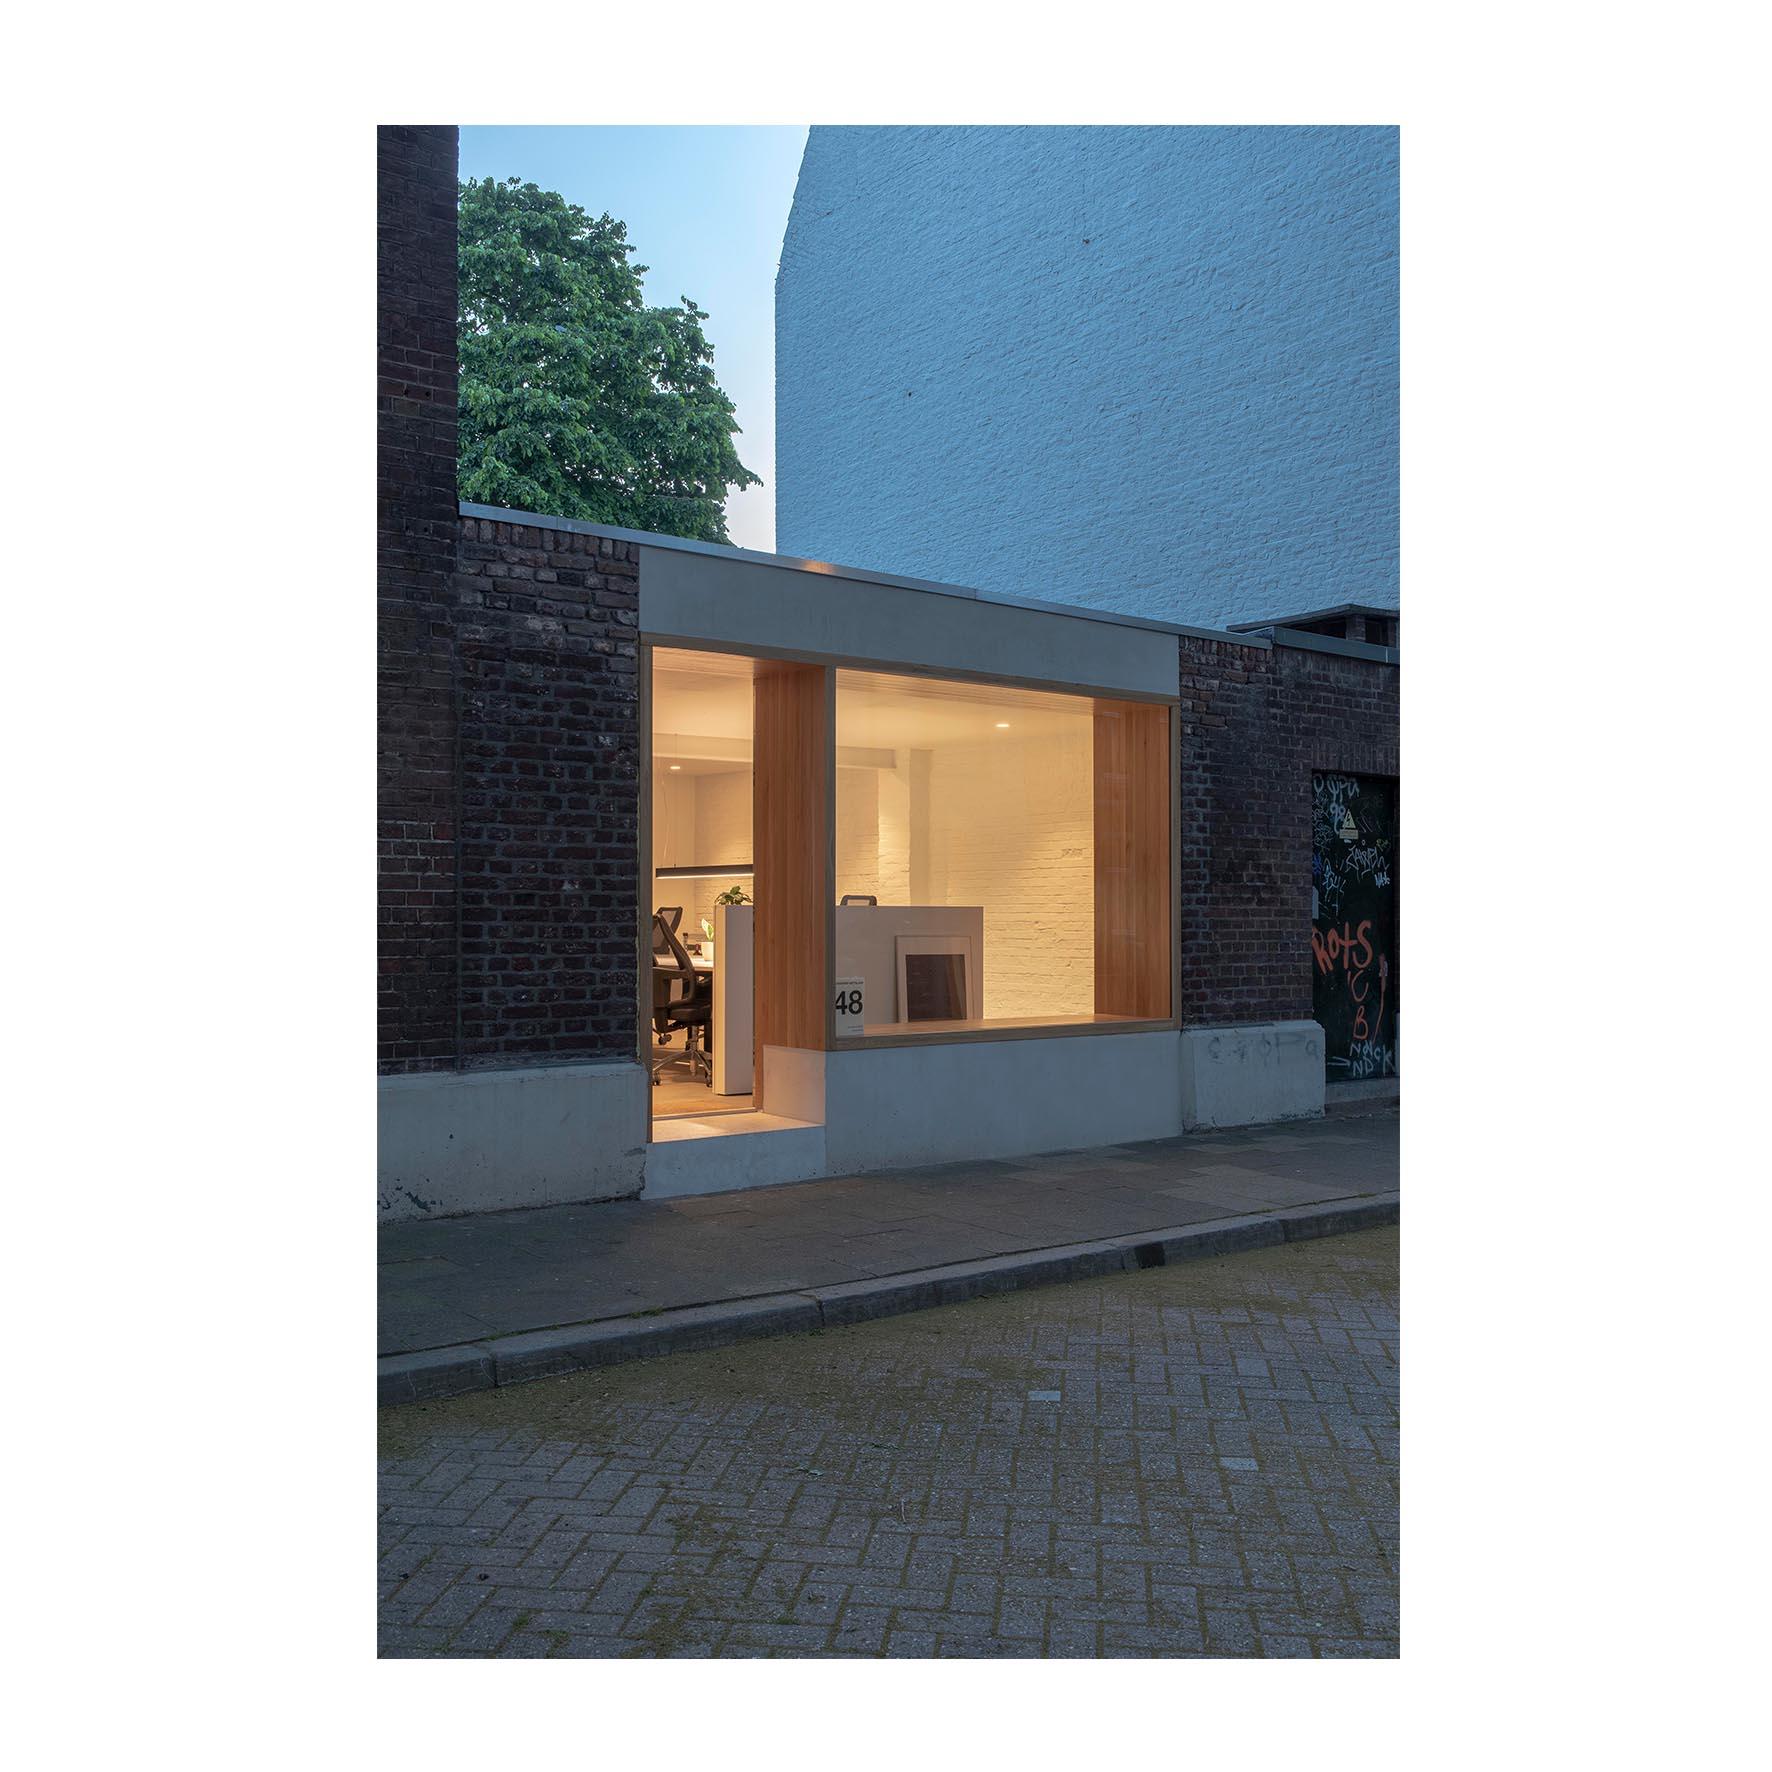 Architectuurfotografie - JDW, Atelier Leise